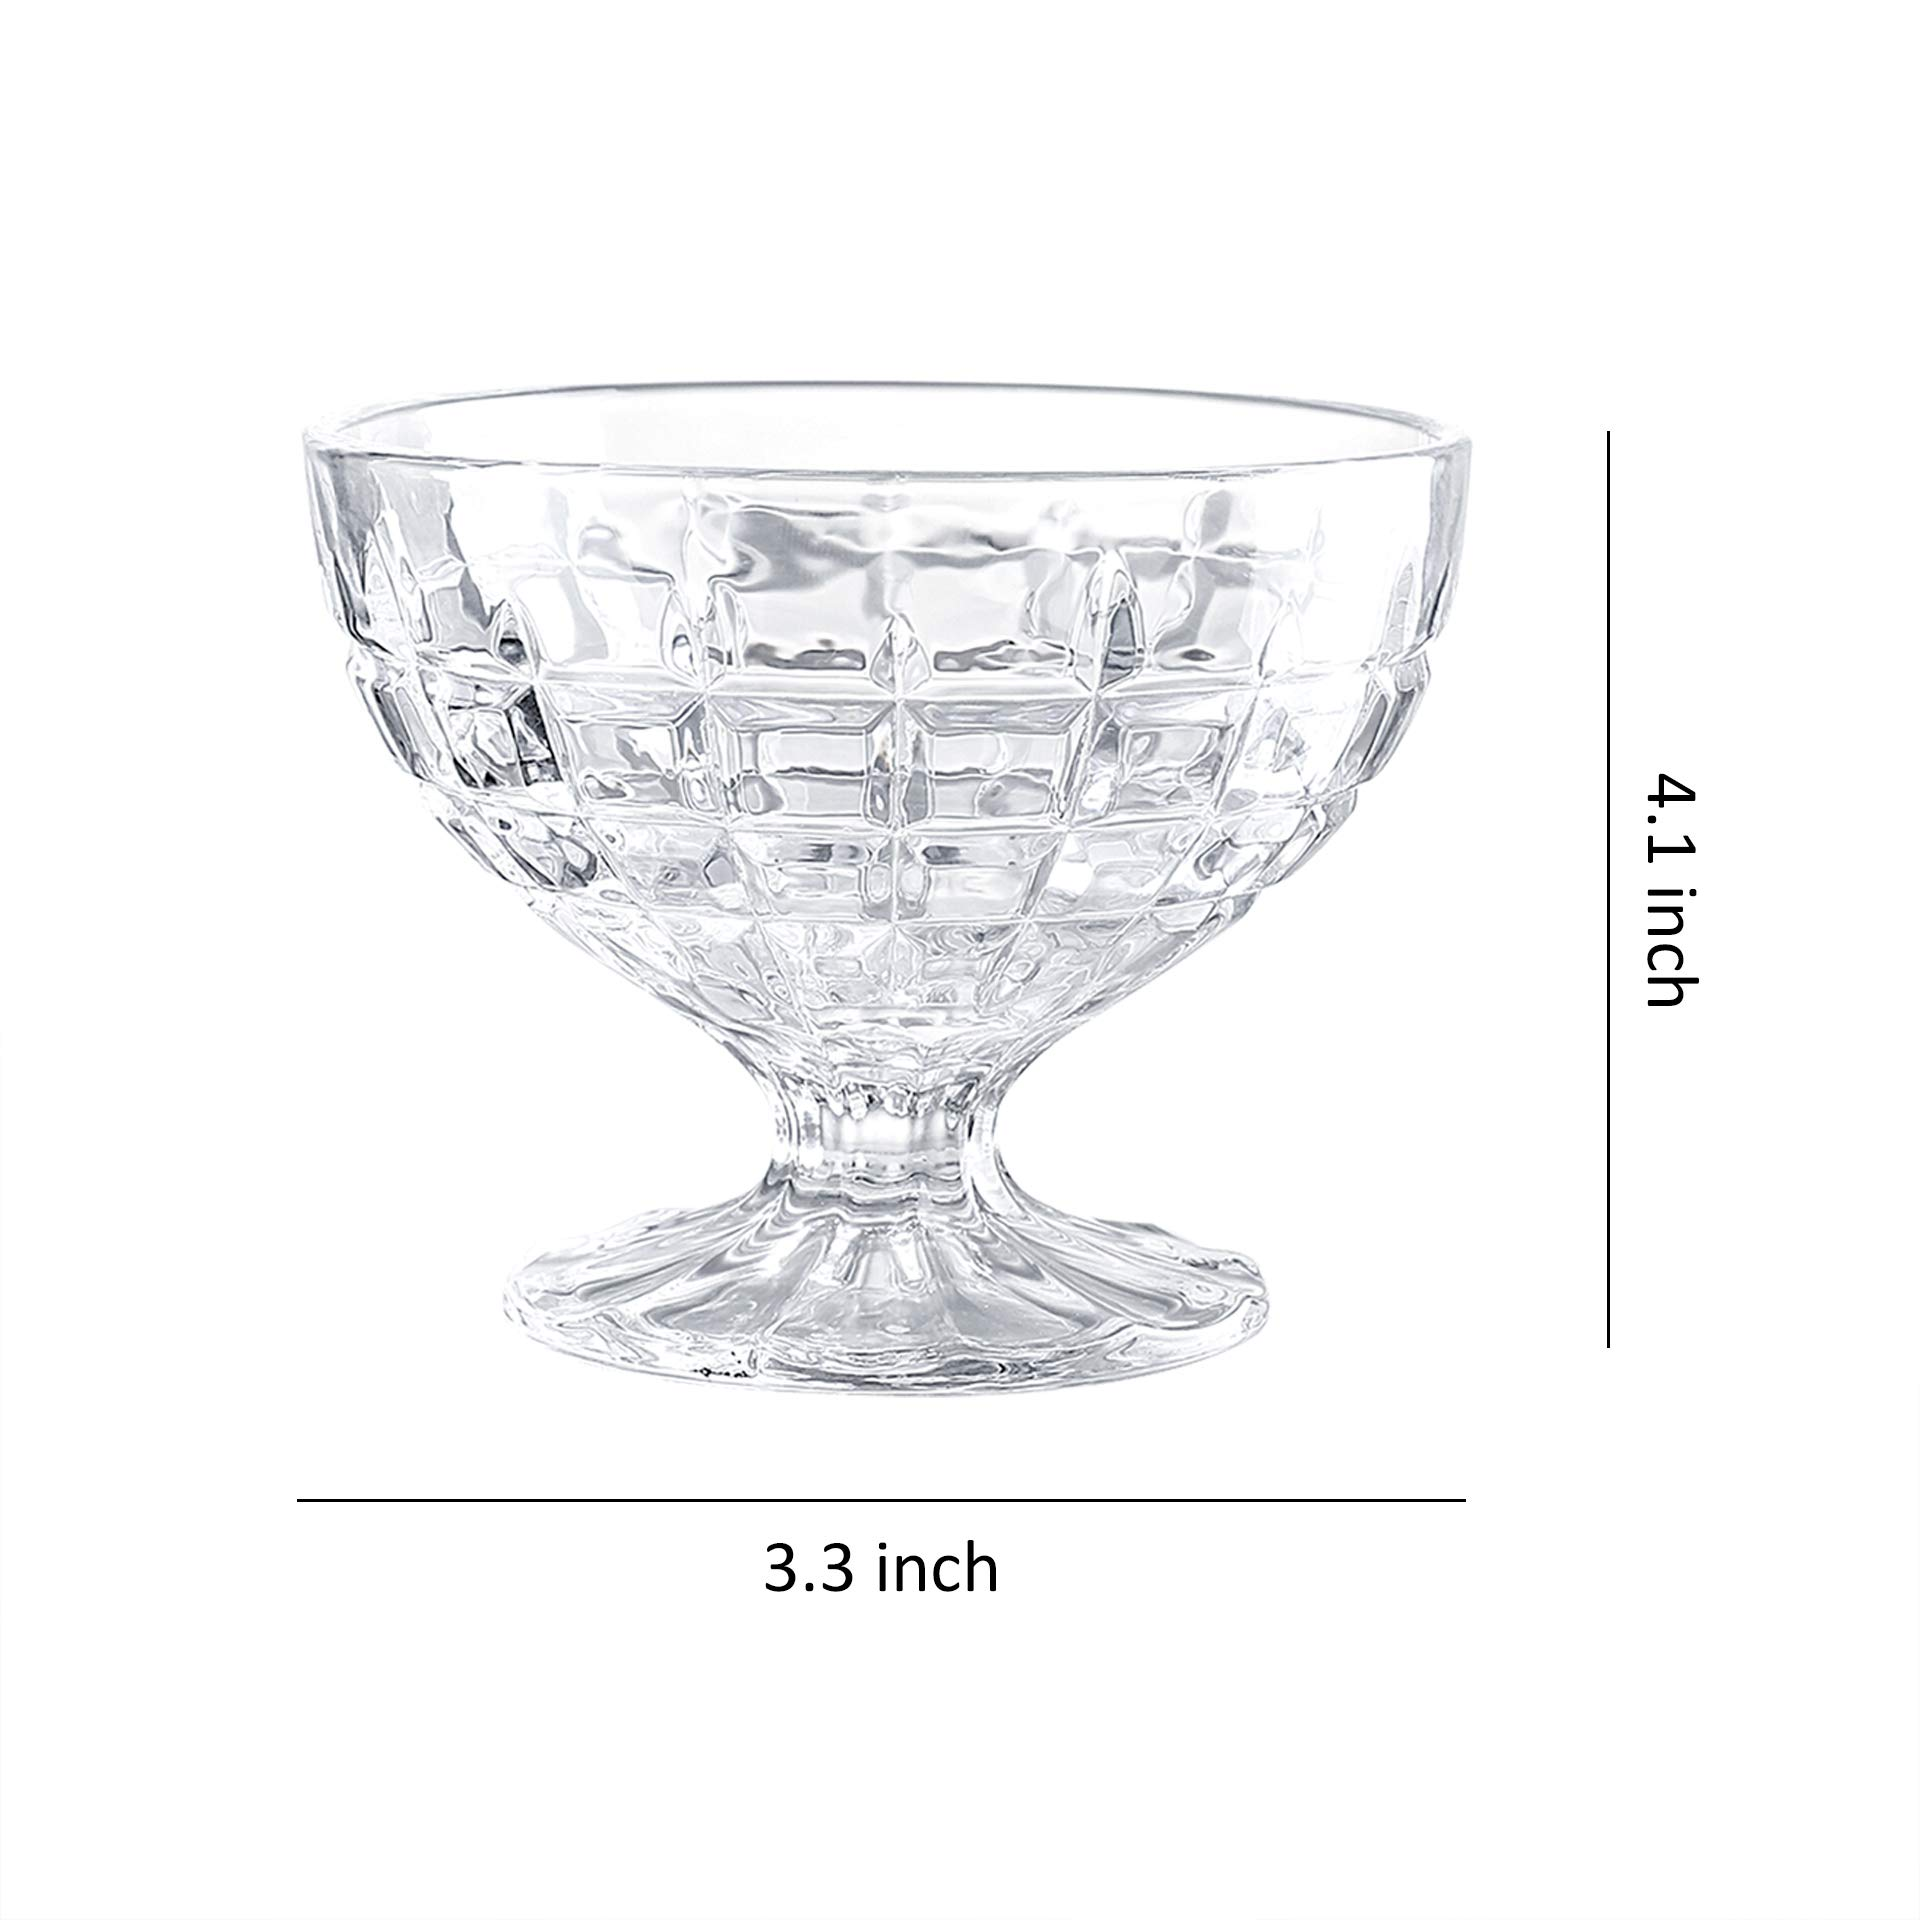 8 Oz Glass Dessert Appetizer Bowl Set of 4